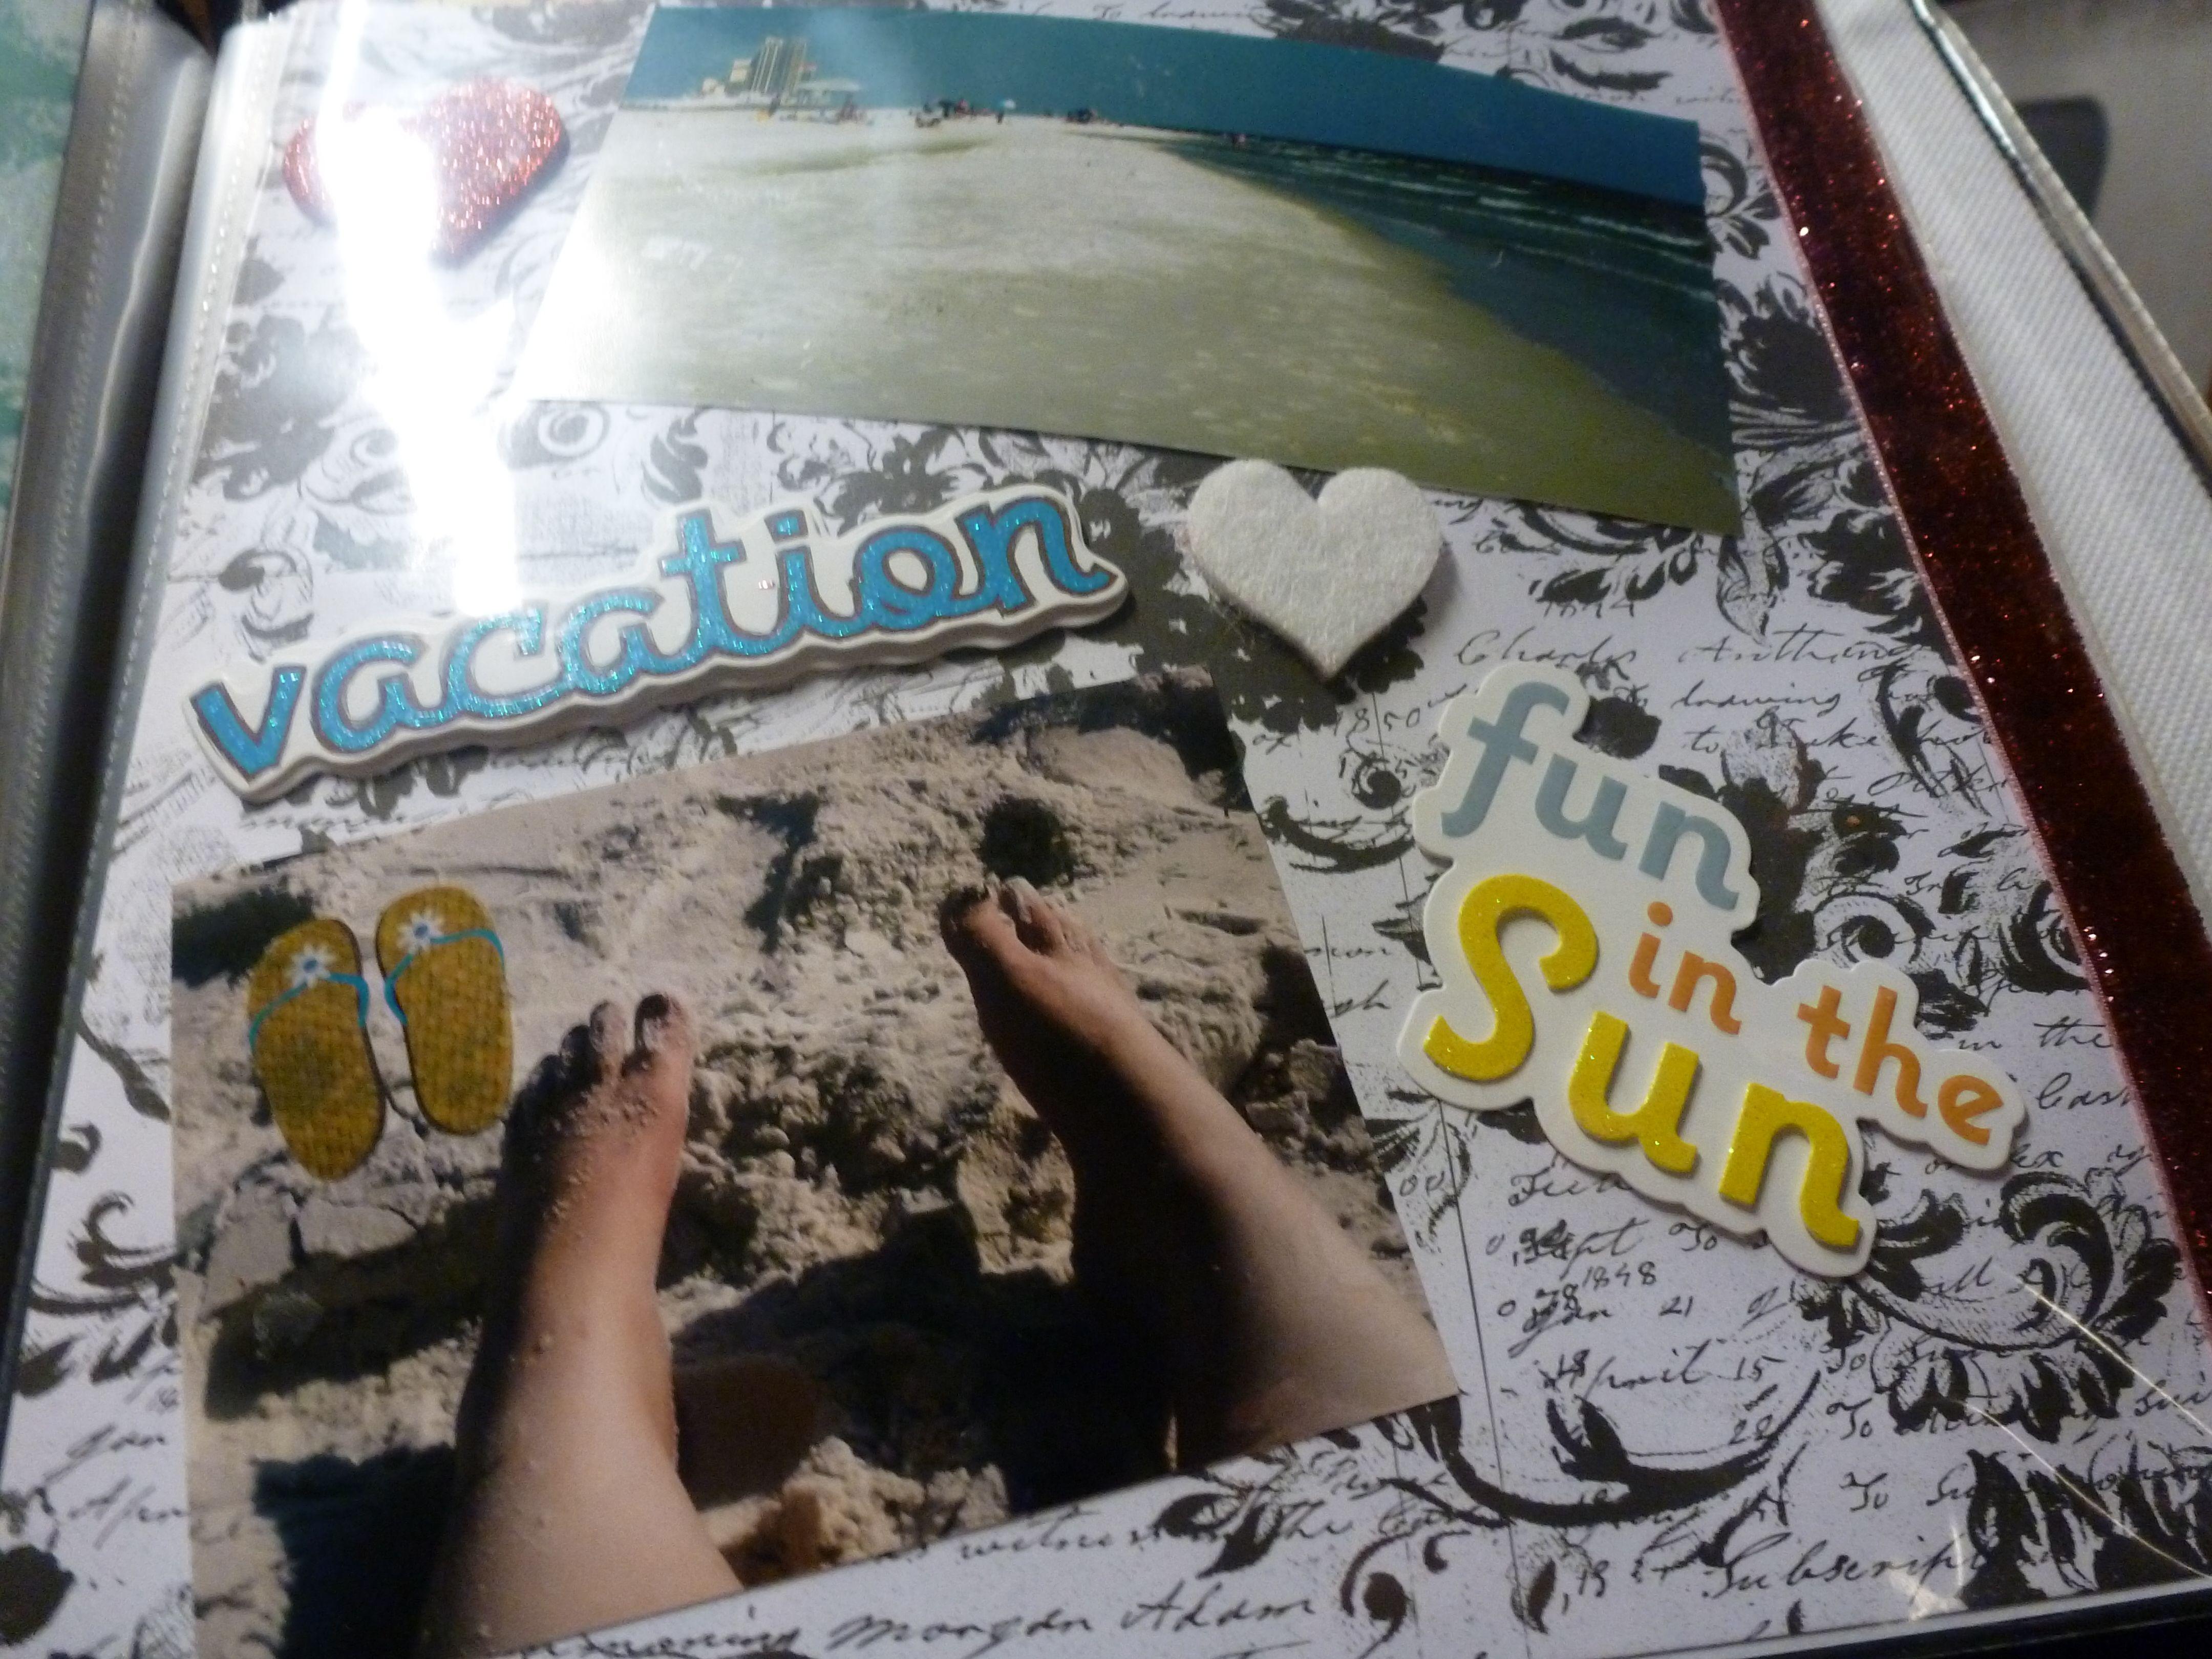 How to scrapbook 8x8 layouts - Gulf Shores Beach Alabama 8x8 Scrapbook Layout